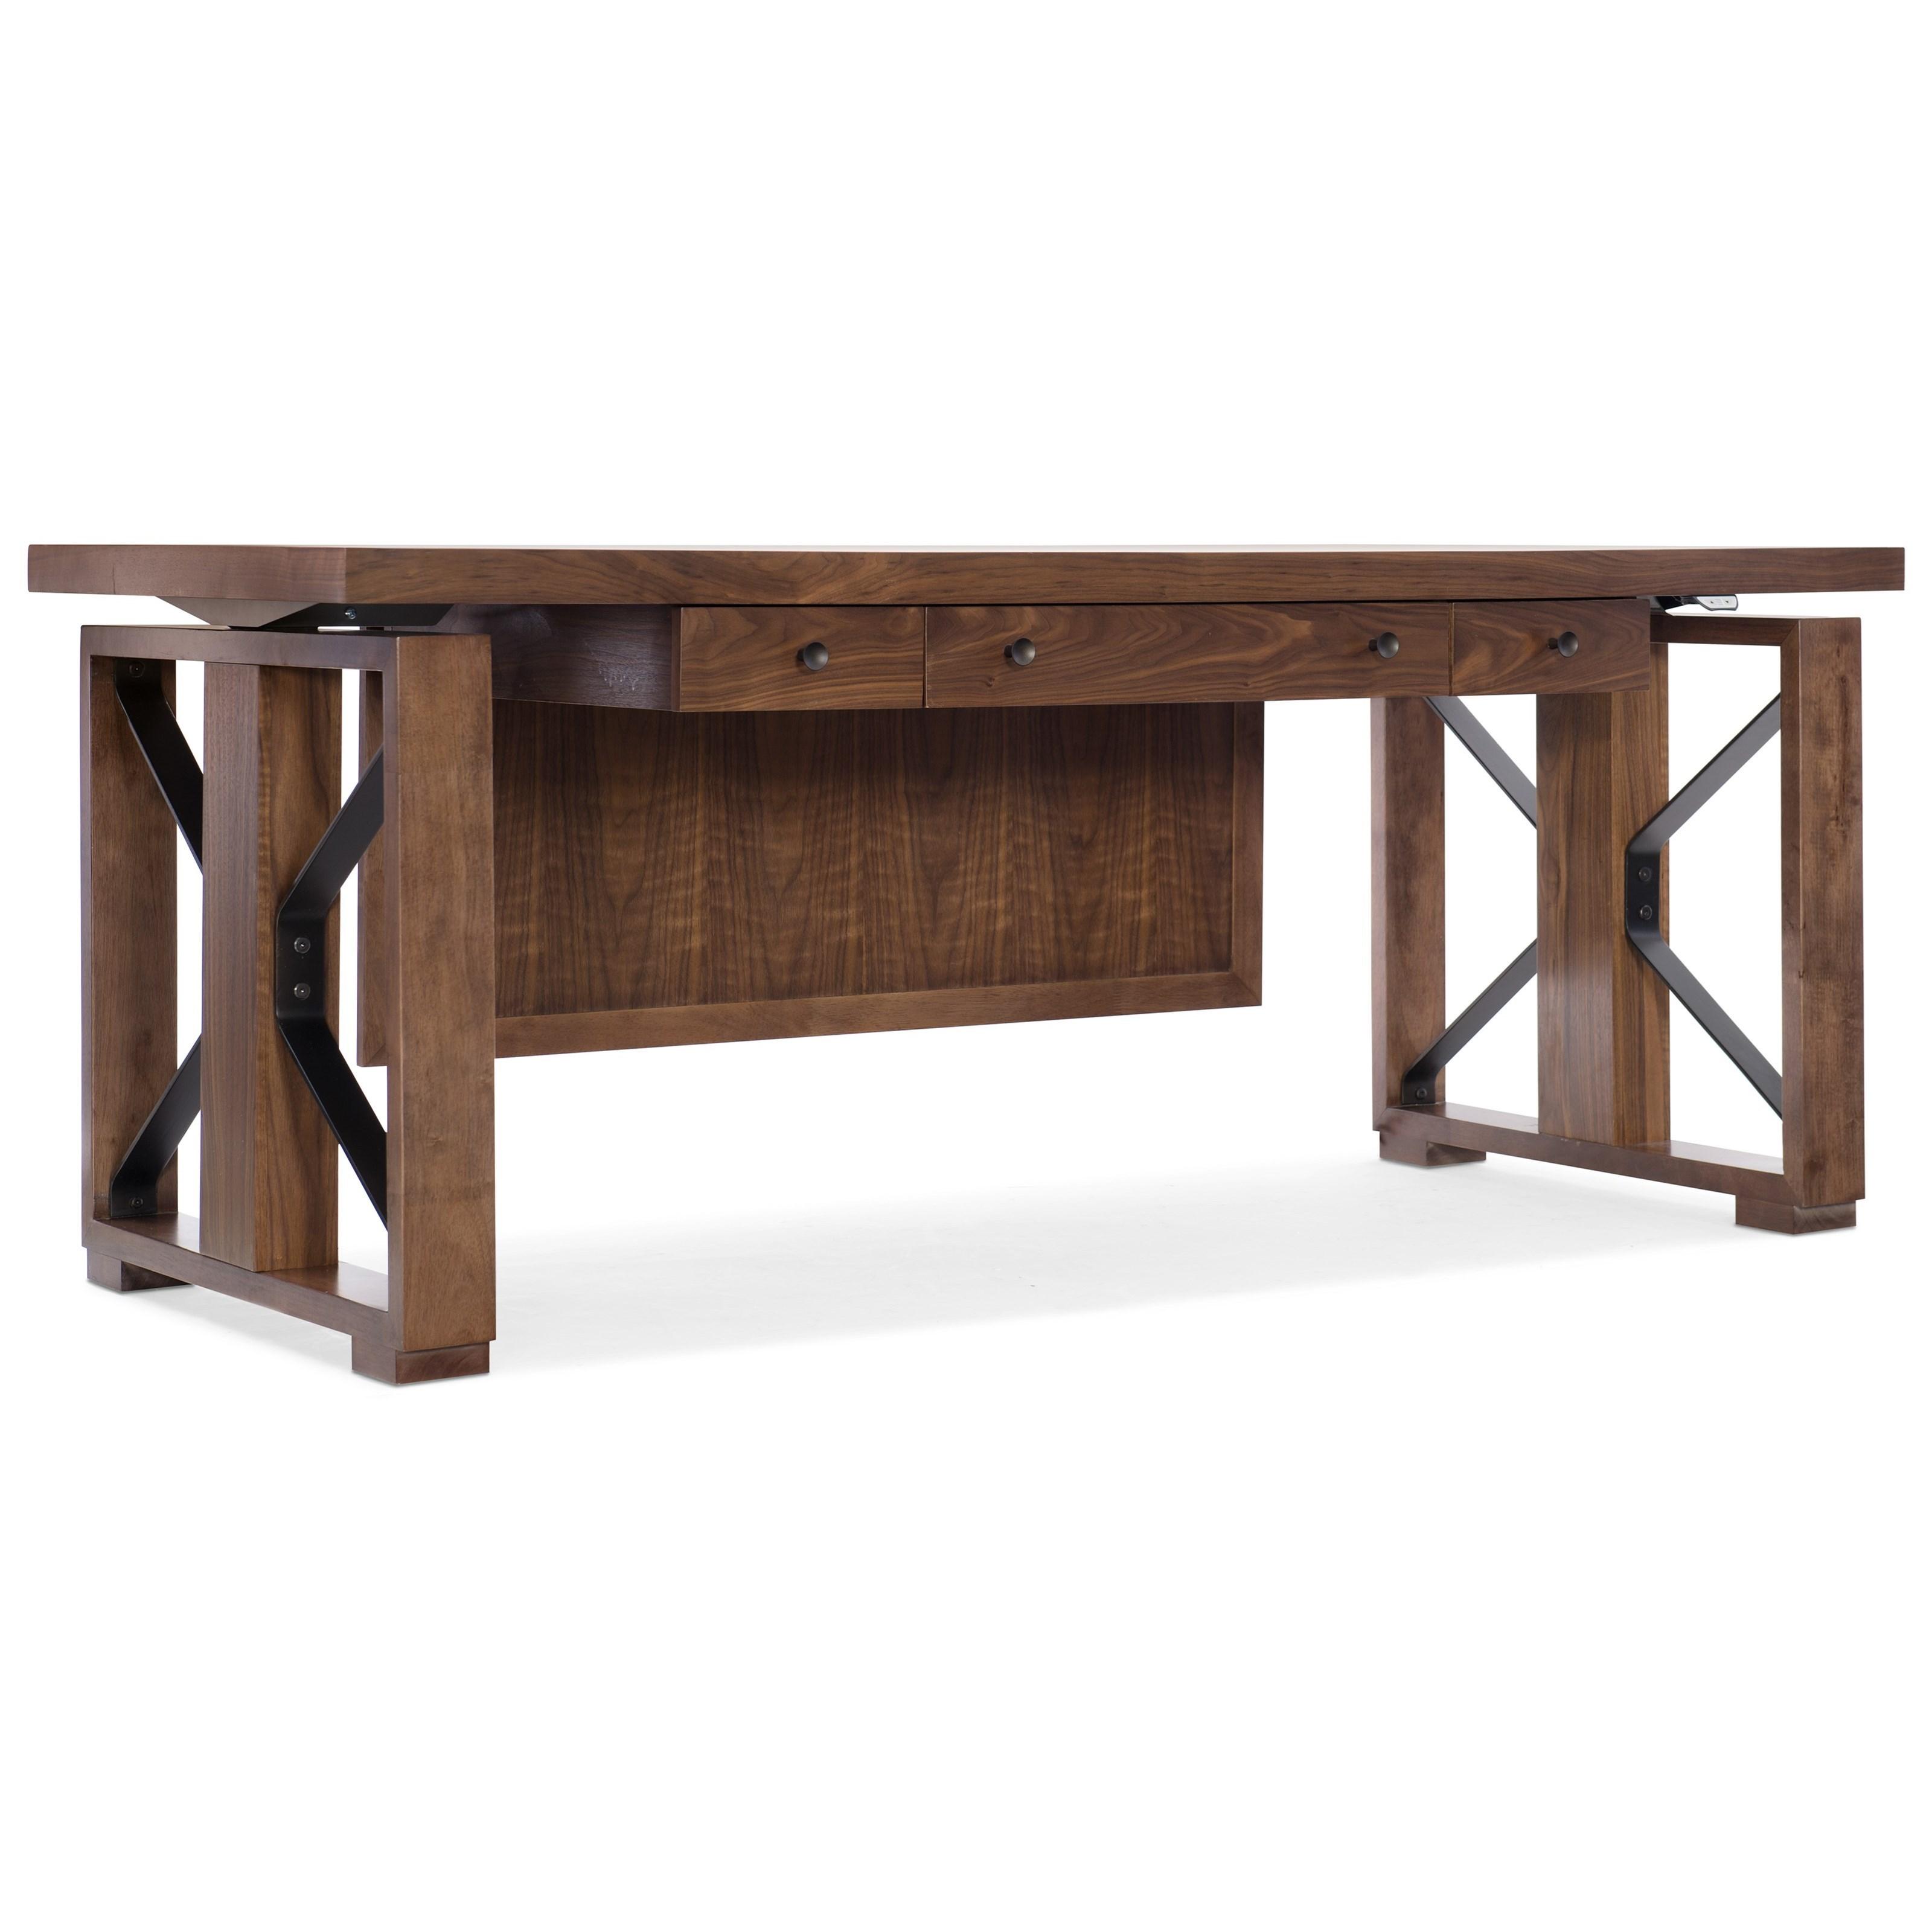 Elon Lift Desk by Hooker Furniture at Stoney Creek Furniture